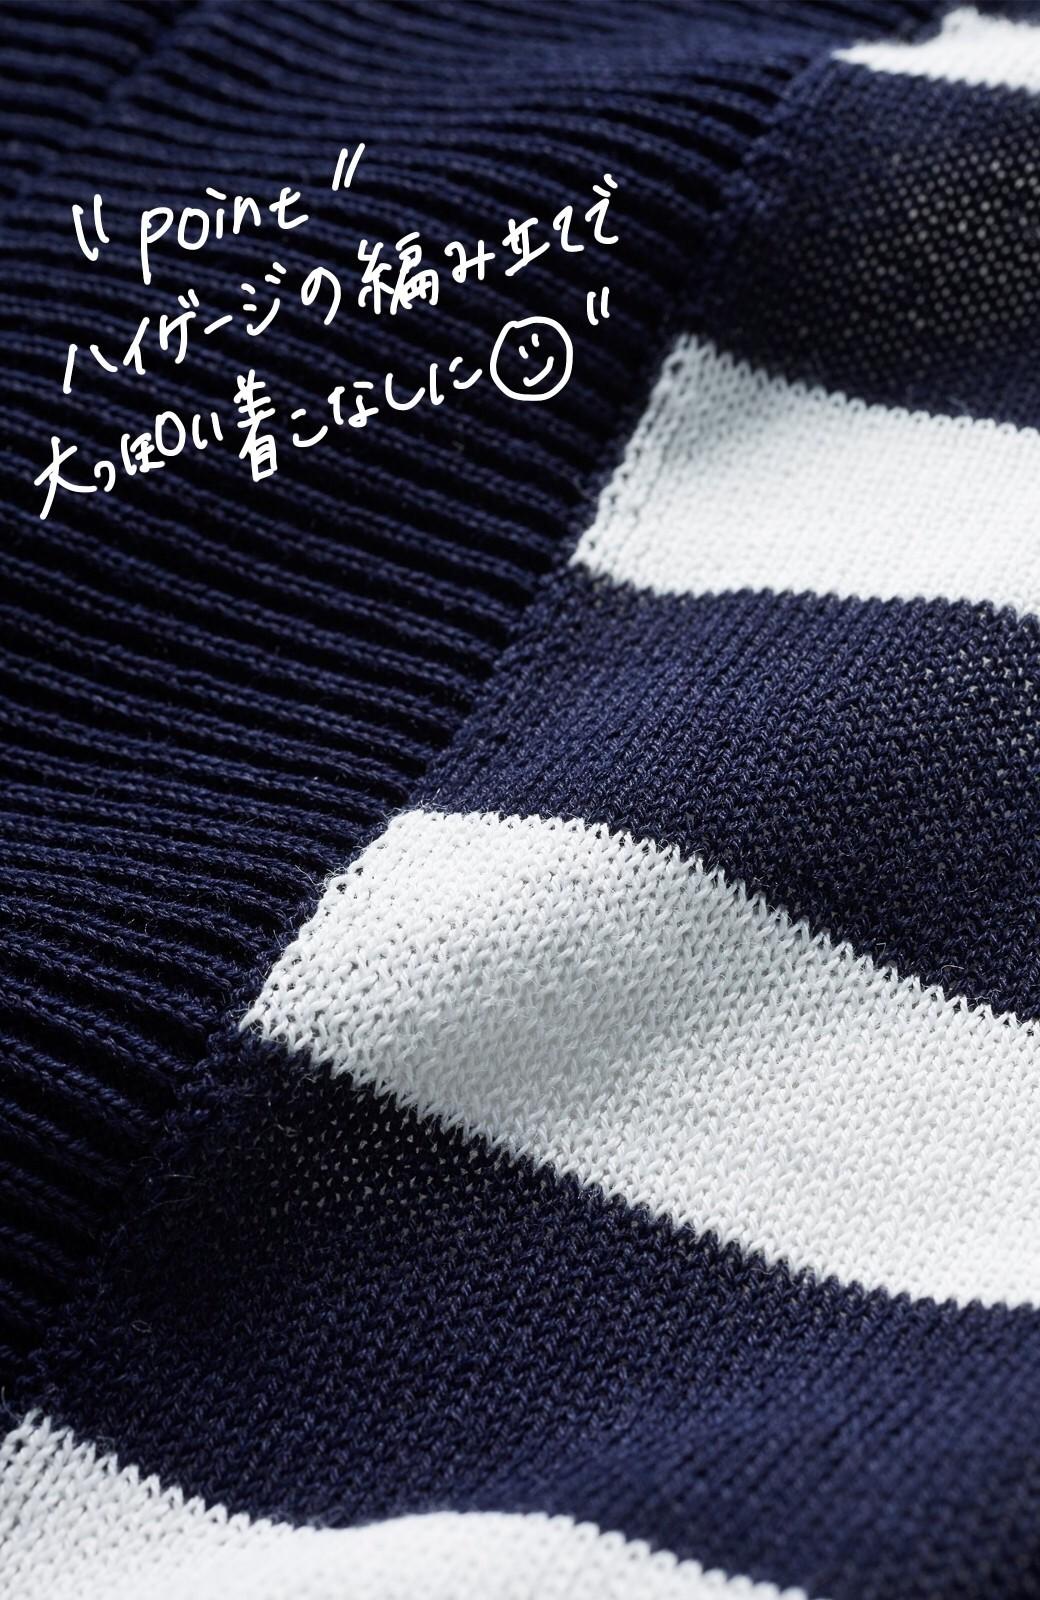 haco! カットソー感覚で着られる 洗えるオトナニットトップス by MAKORI <ブルー系その他>の商品写真3